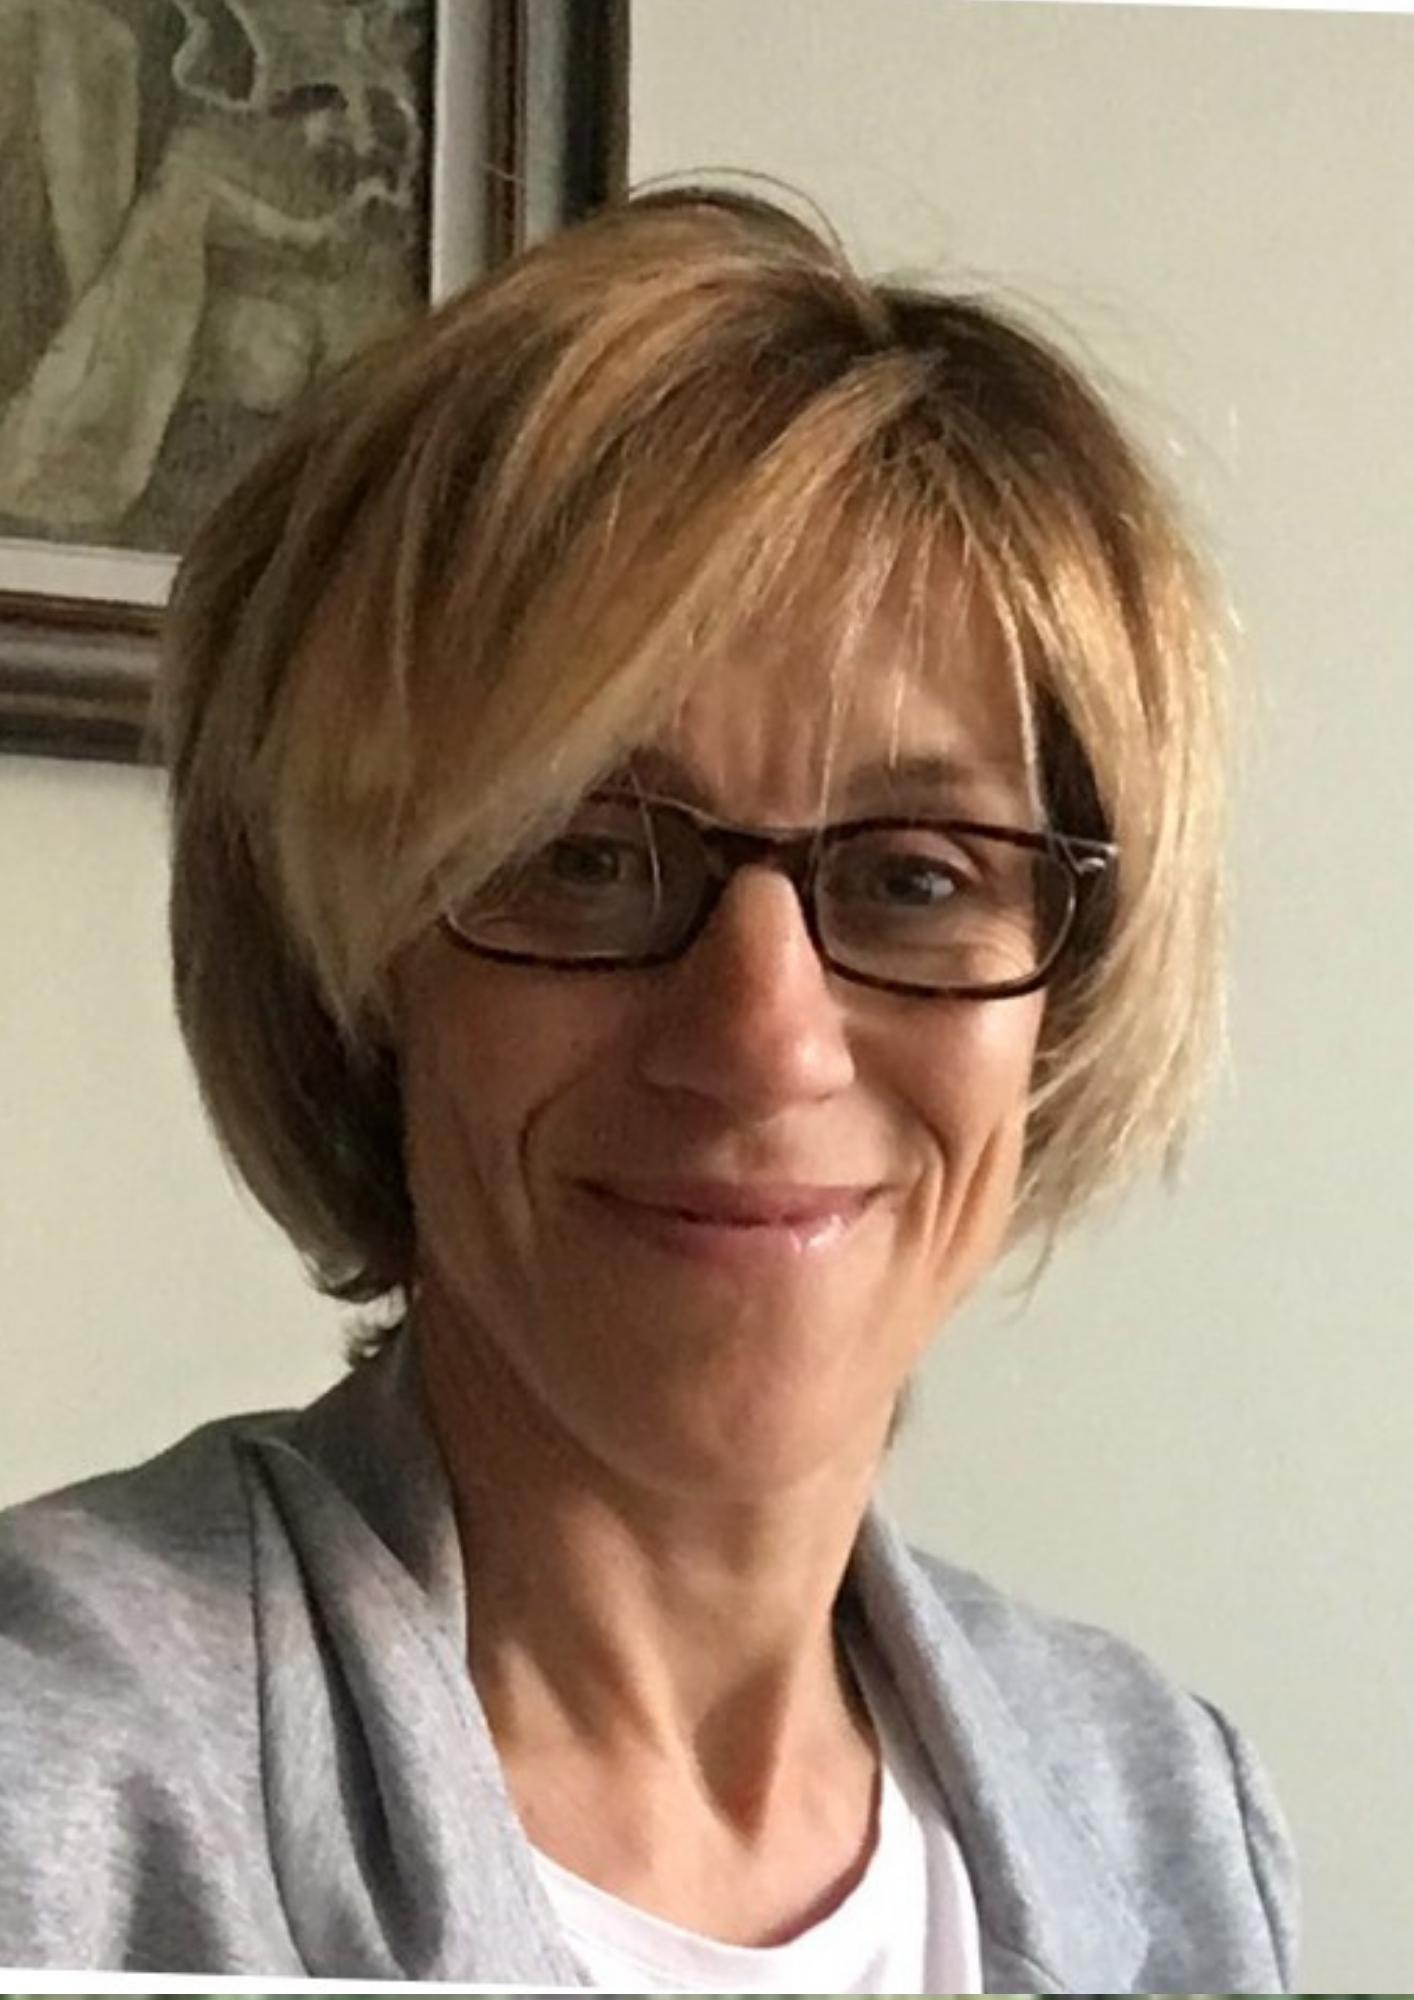 Dott.ssa Stefania Zanolini